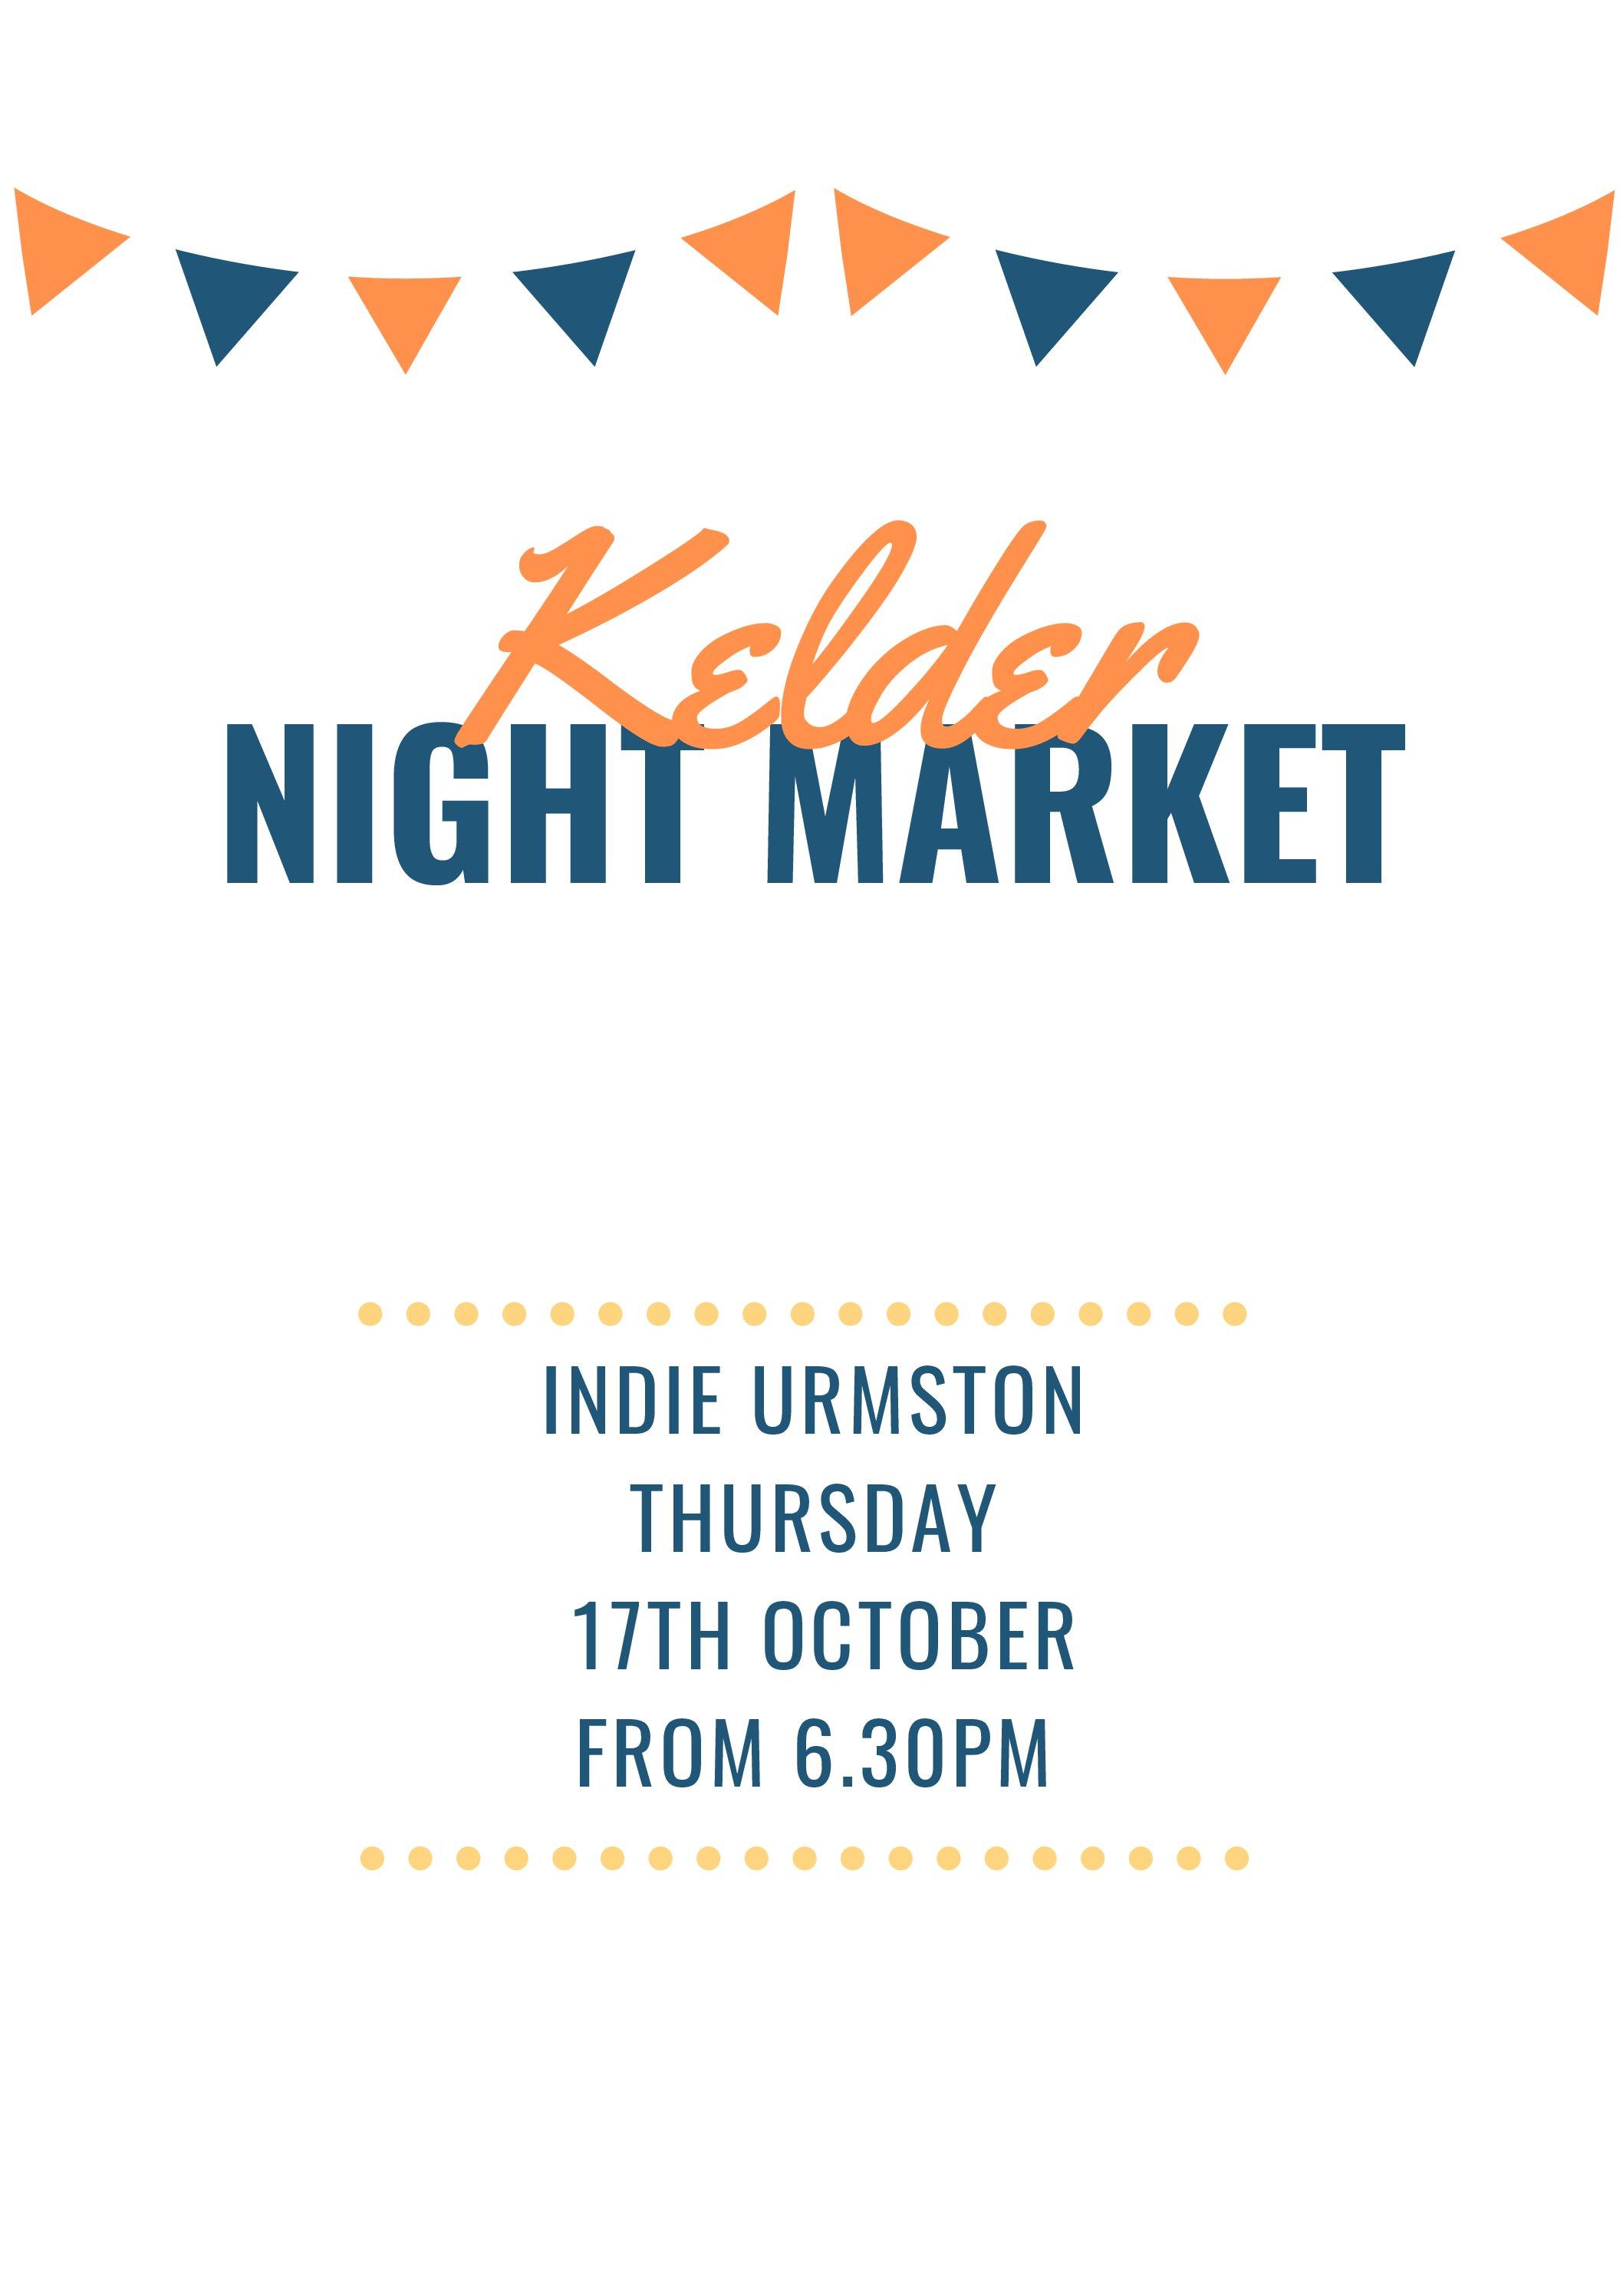 Indie Urmston – Kelder Night Market